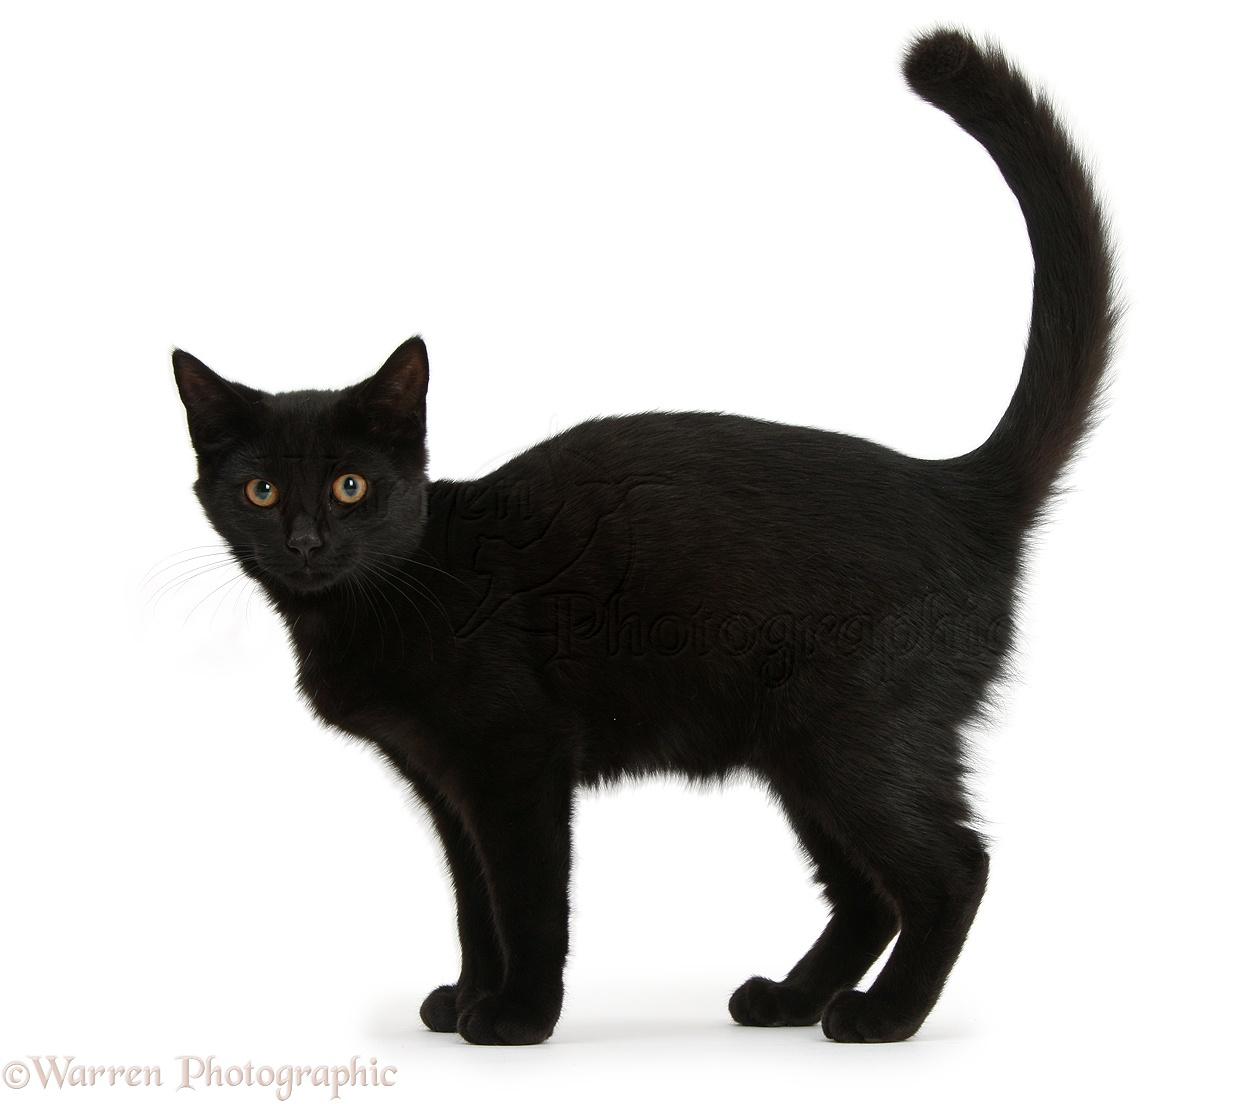 Black cat standing photo WP